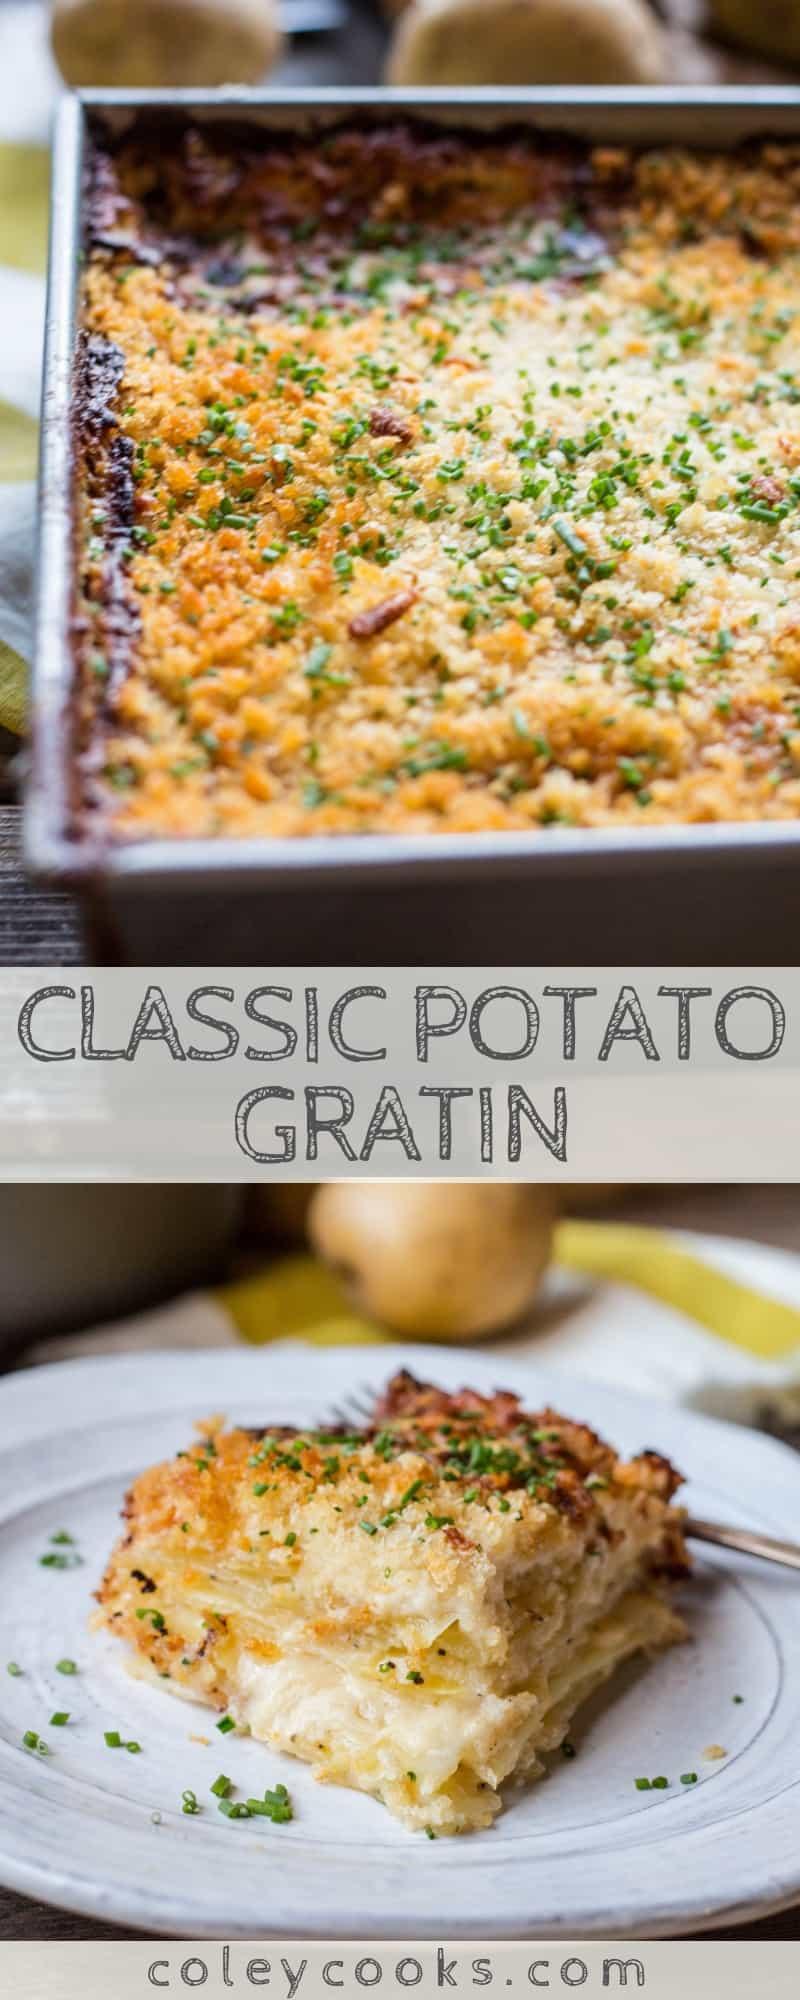 CLASSIC POTATO GRATIN | This classic recipe for potato gratin is a simple, show stopping potato side dish recipe! Rich, creamy, crunchy side dish perfection. #Thanksgiving #side #Christmas #potato #gratin #classic #recipe #easy | ColeyCooks.com